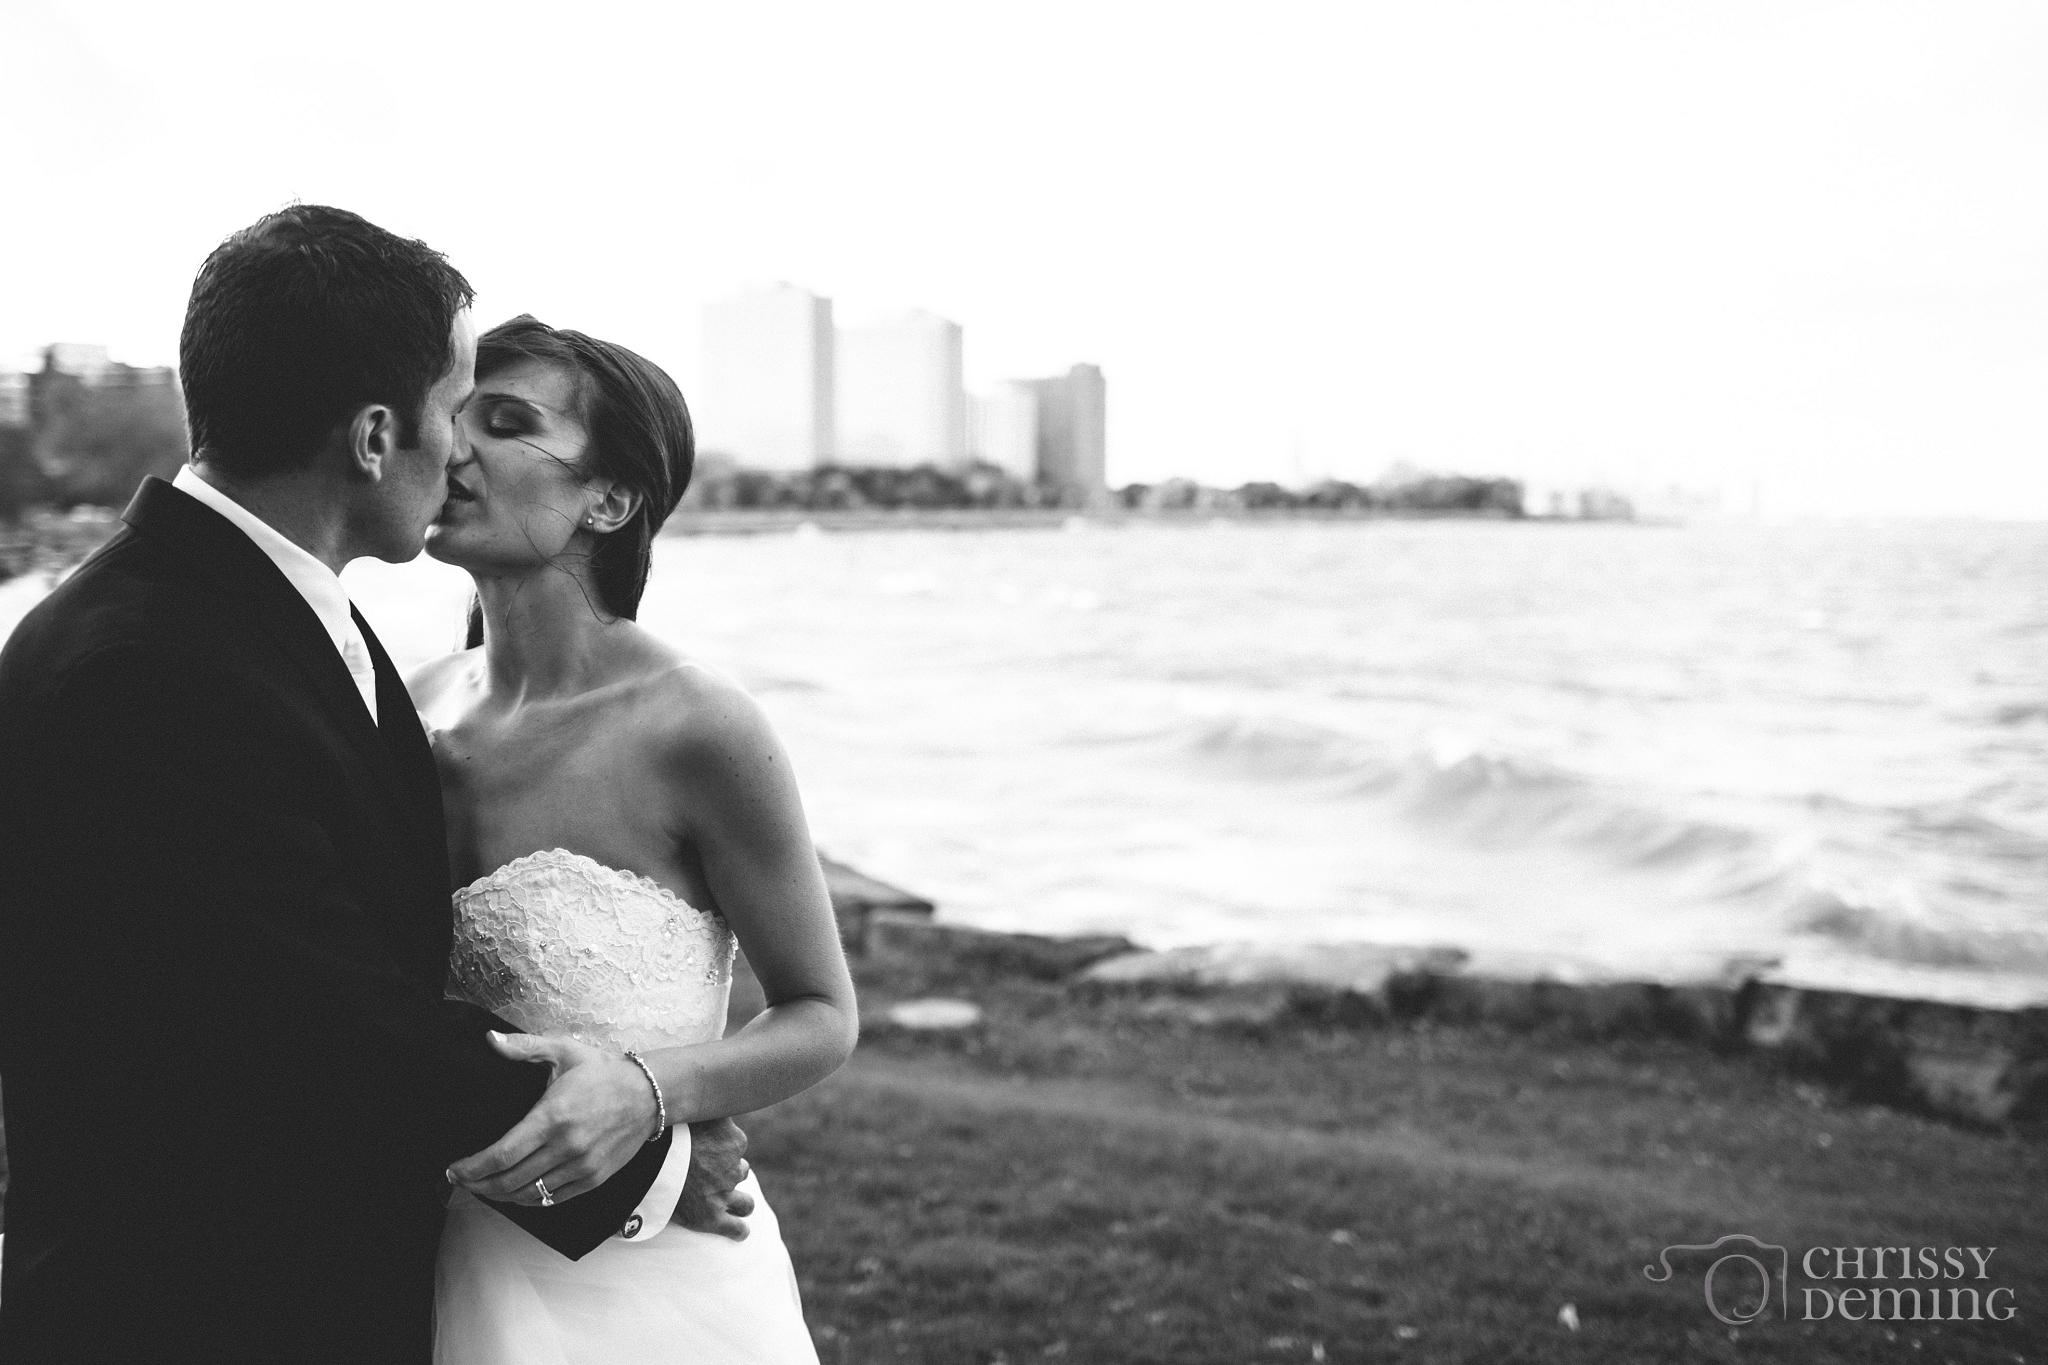 promontory_point_chicago_wedding_photography_0023.jpg